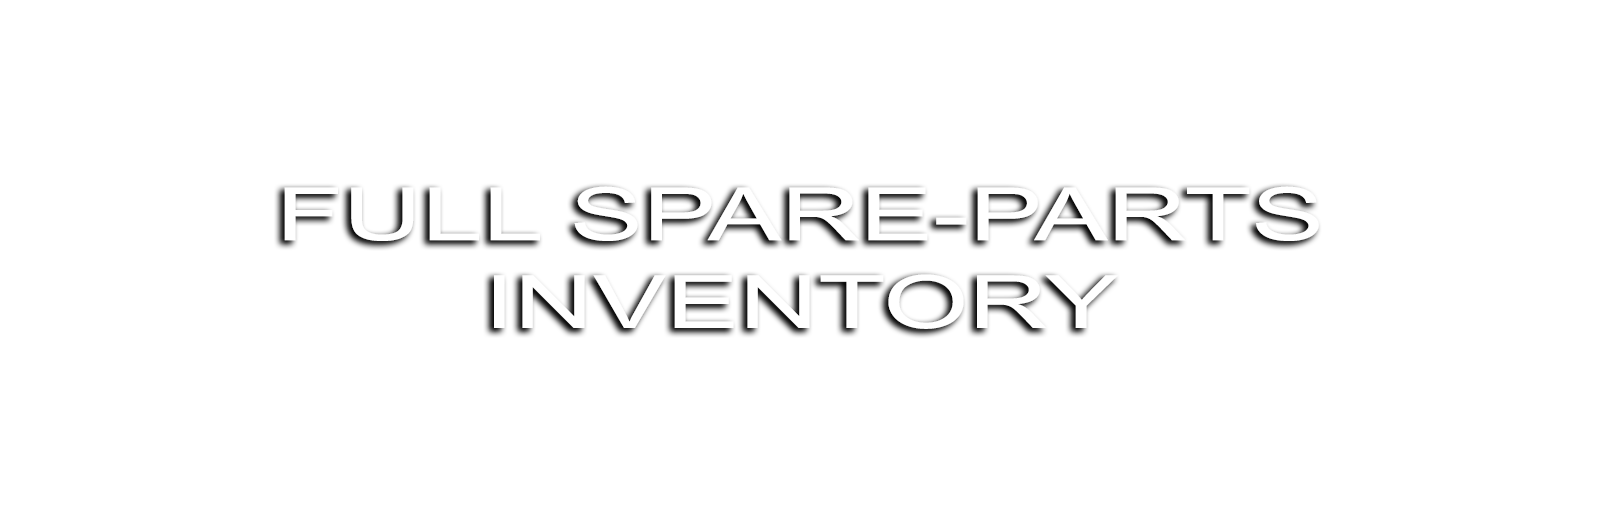 Multivac spare parts